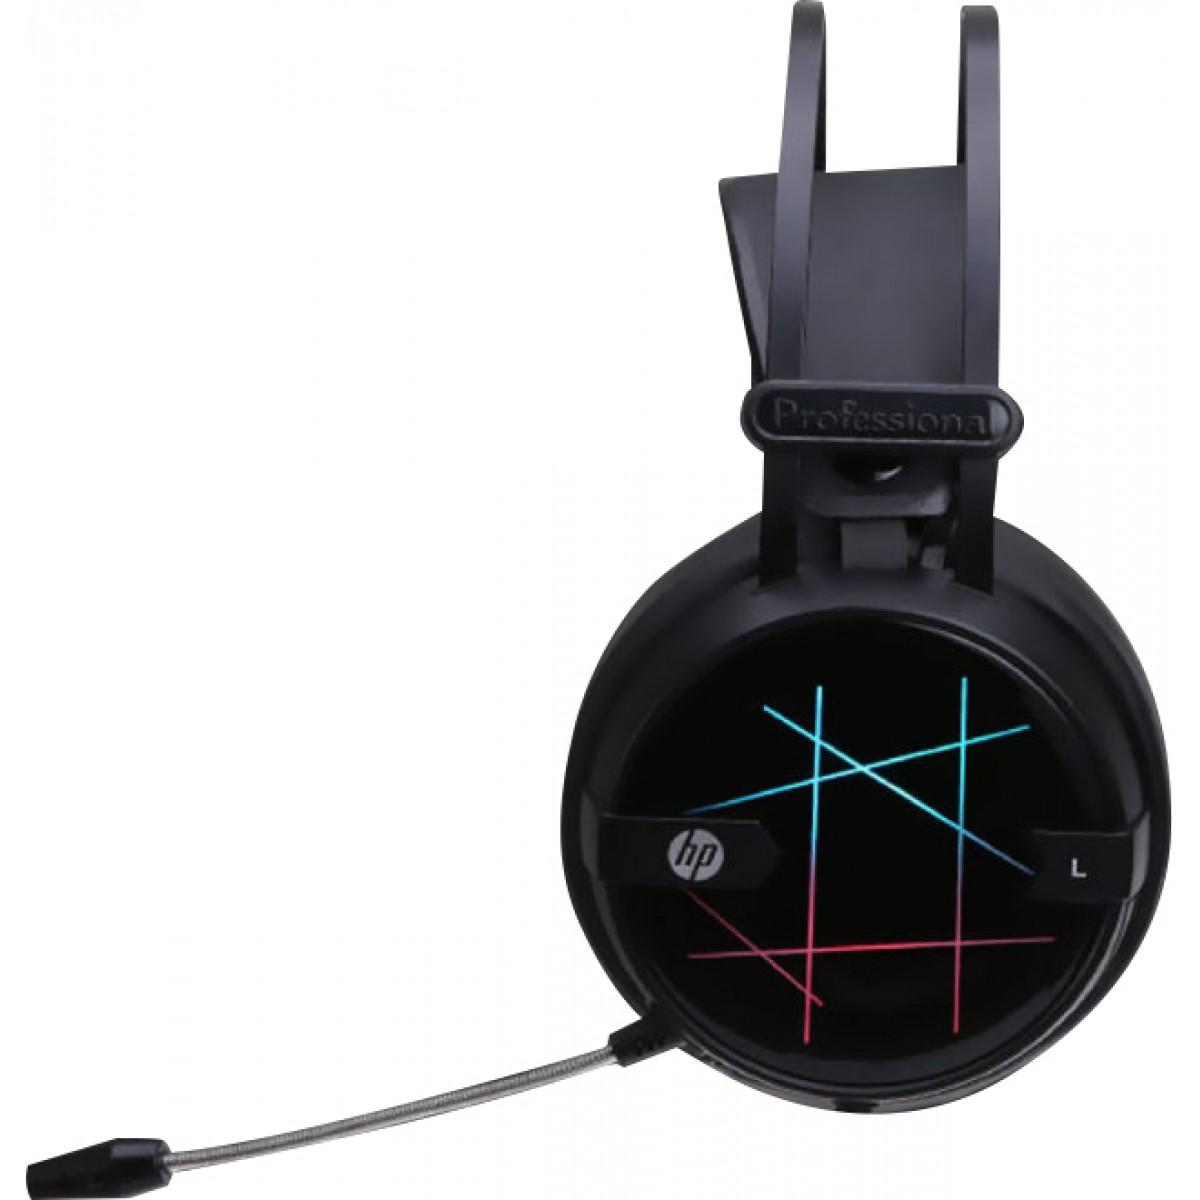 FONE C/MICROFONE HP GAMER STEREO USB H160G LED PRETO-Garantia: 365 dias